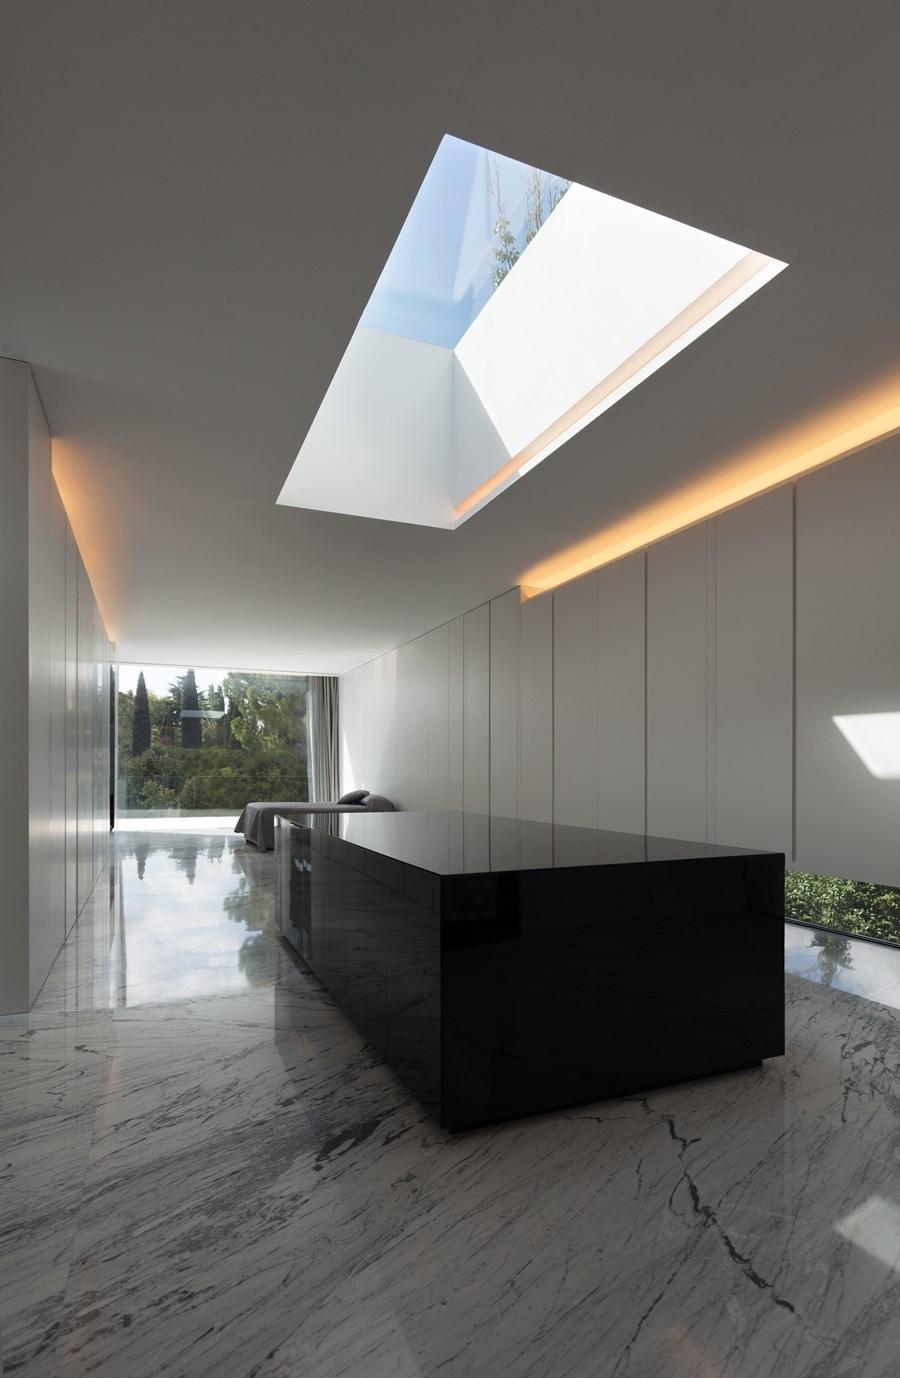 Aluminium House by Fran Silvestre Arquitectos 16